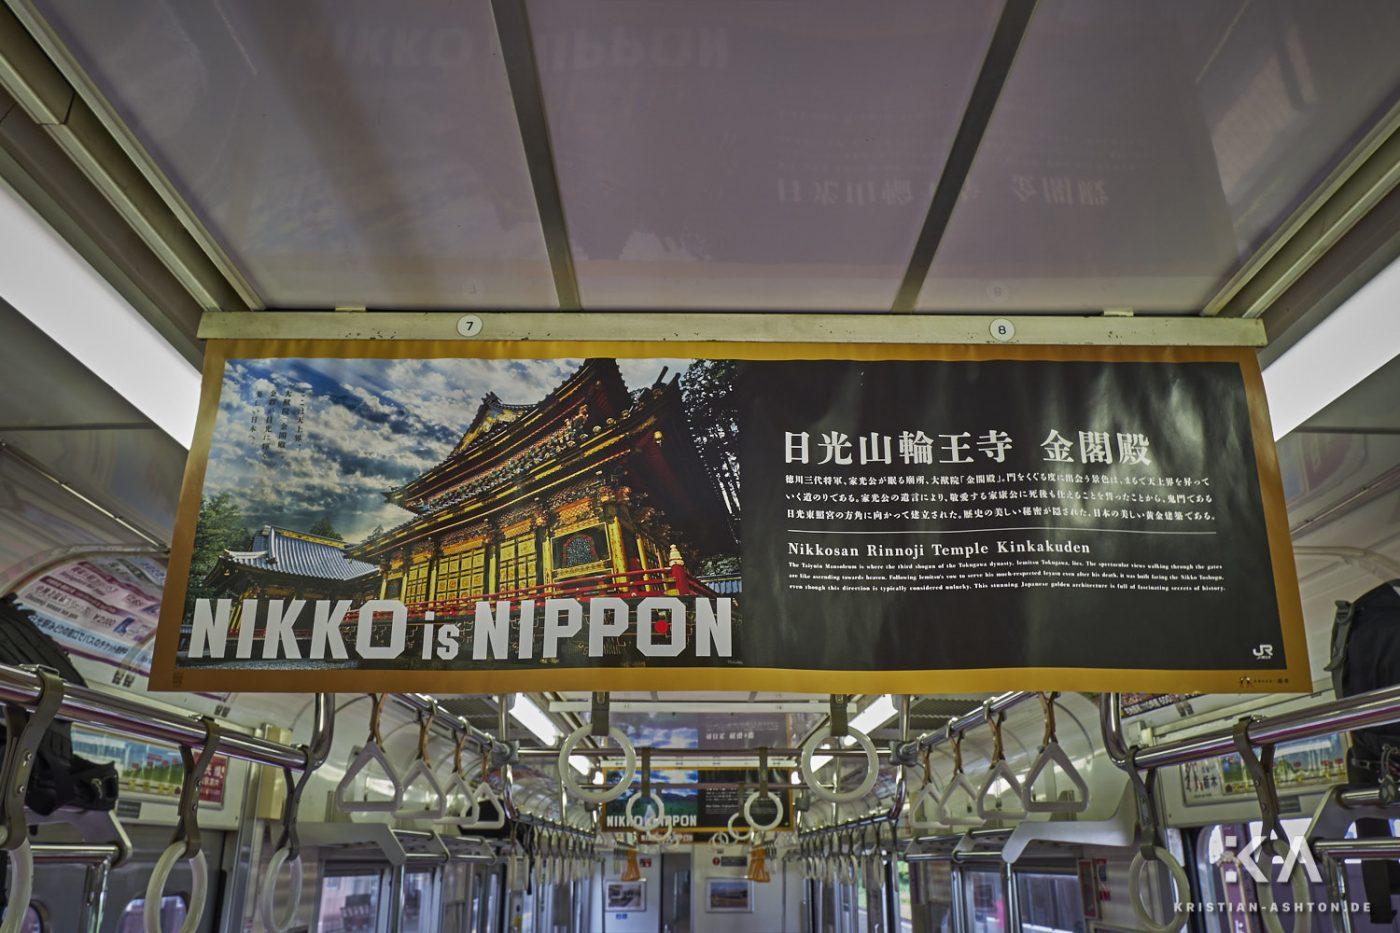 Our Nikko Line train from Nikko to Utsunomiya